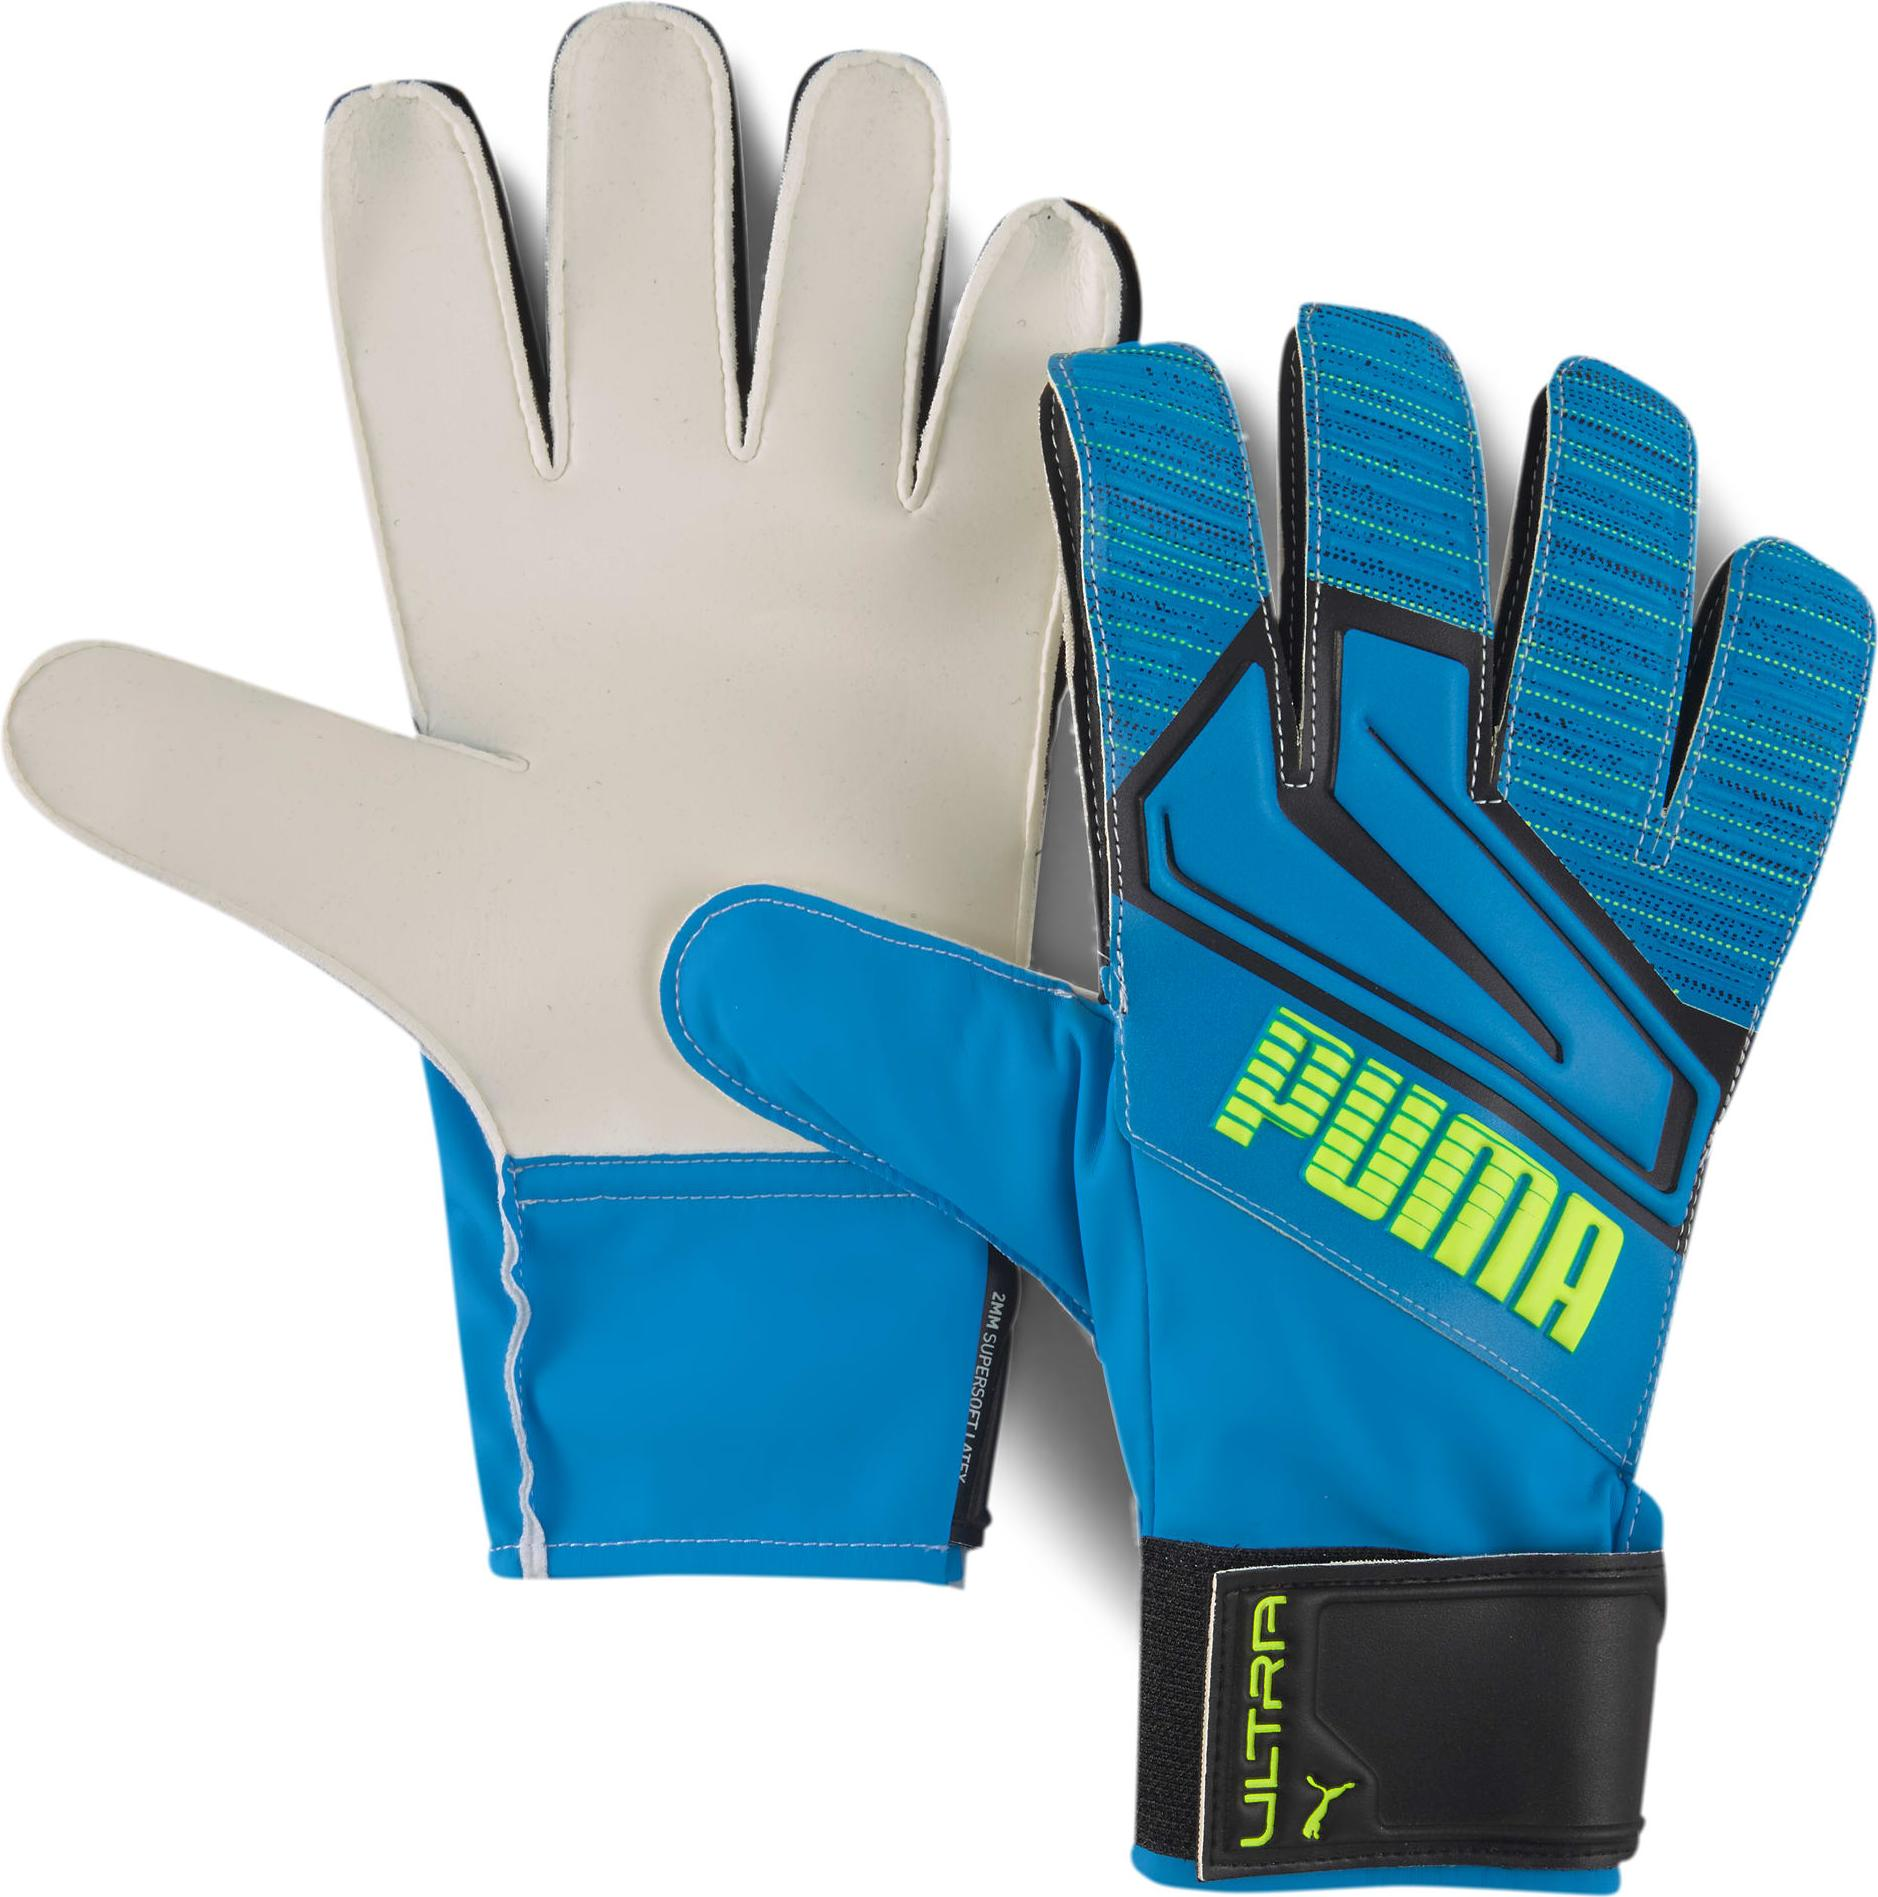 Brankářské rukavice Puma ULTRA Grip 4 RC